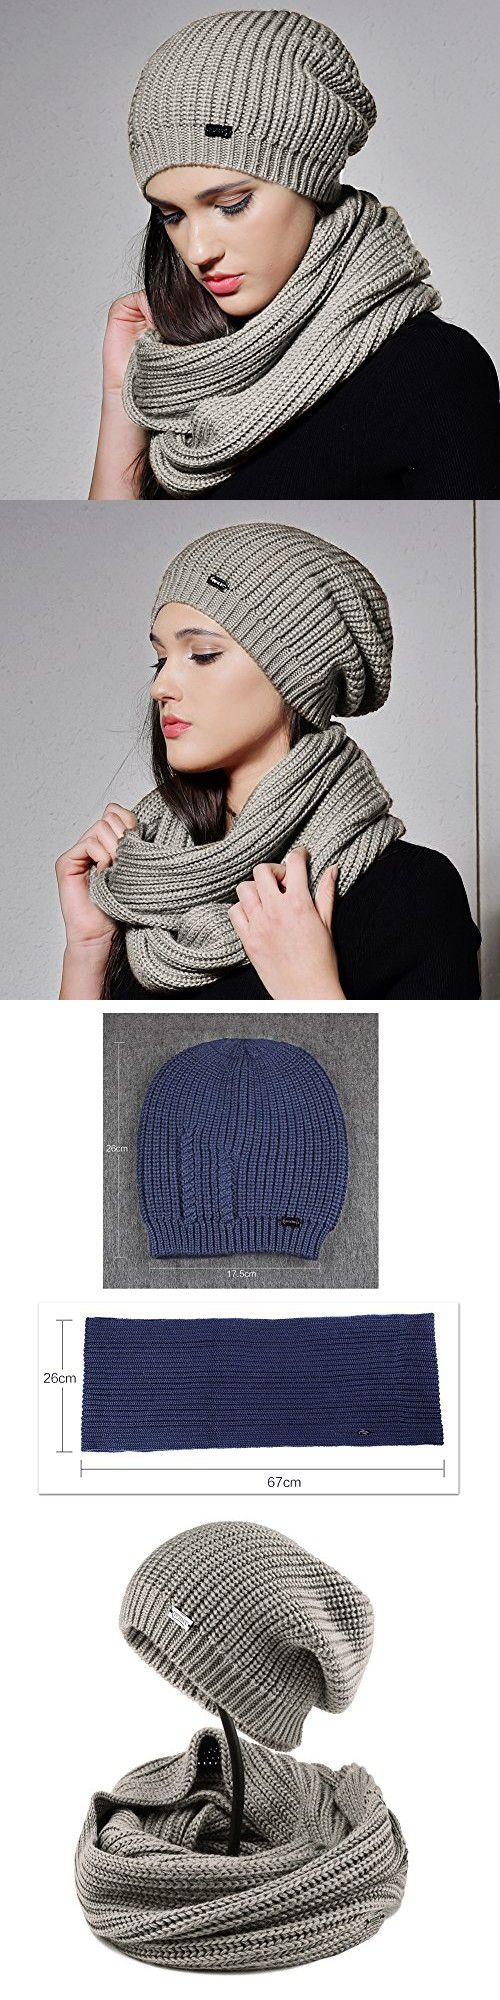 1be52d8a829 FURTALK Women Girls Merino Wool Slouchy Knit Beanie Hat Scarf Set Soft  Winter Crochet Cap (Grey)